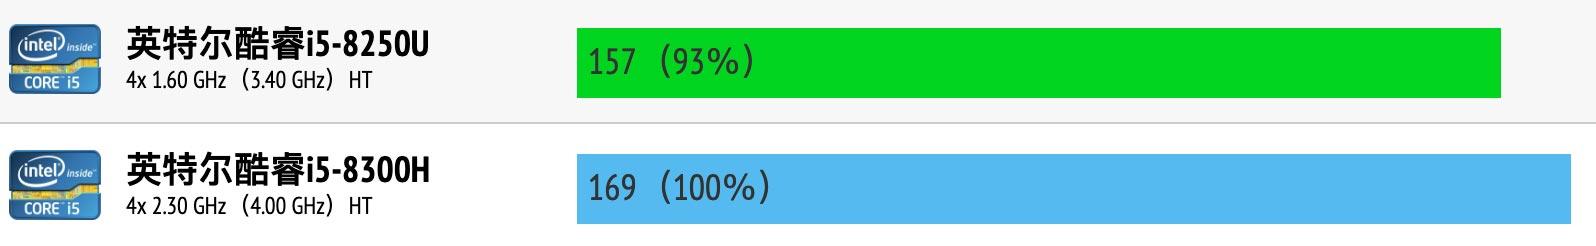 Intel Core i5-8250U和i5-8300H性能跑分对比评测